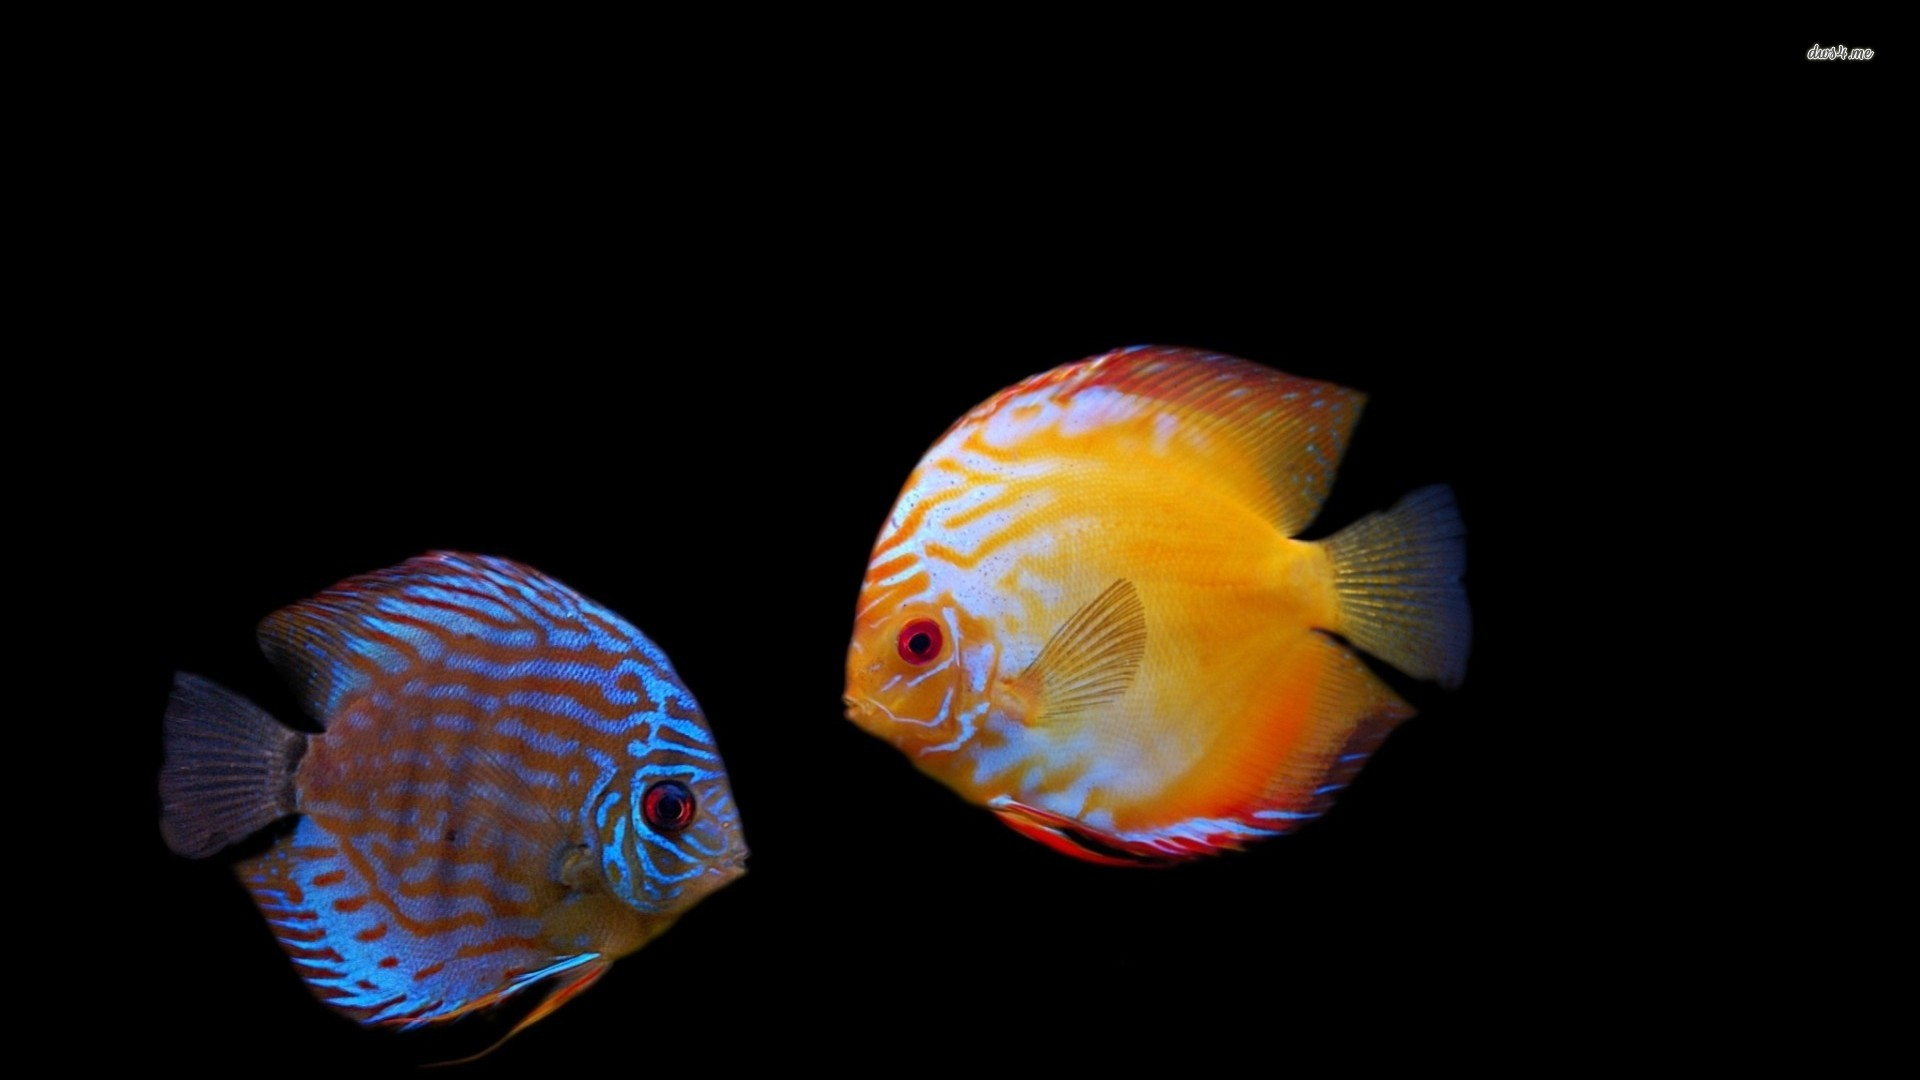 Tropical Ocean 3d Live Wallpaper Free Tropical Fish Wallpapers Group 77